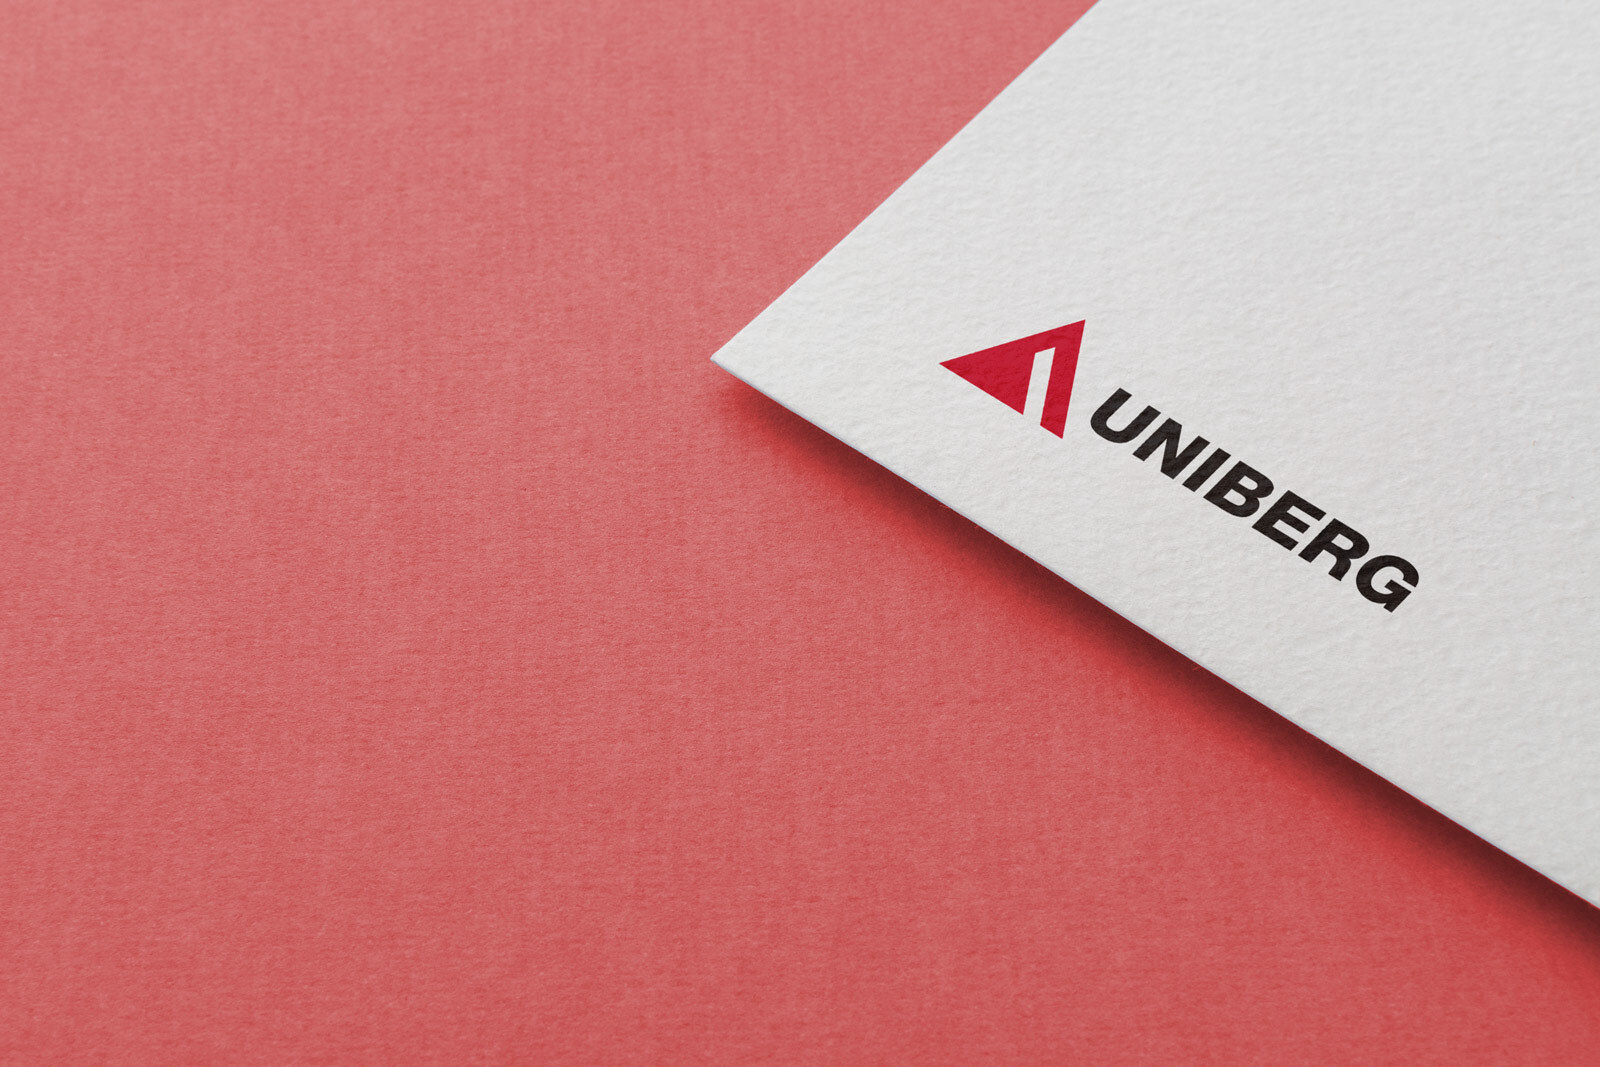 Copy of UNIBERG